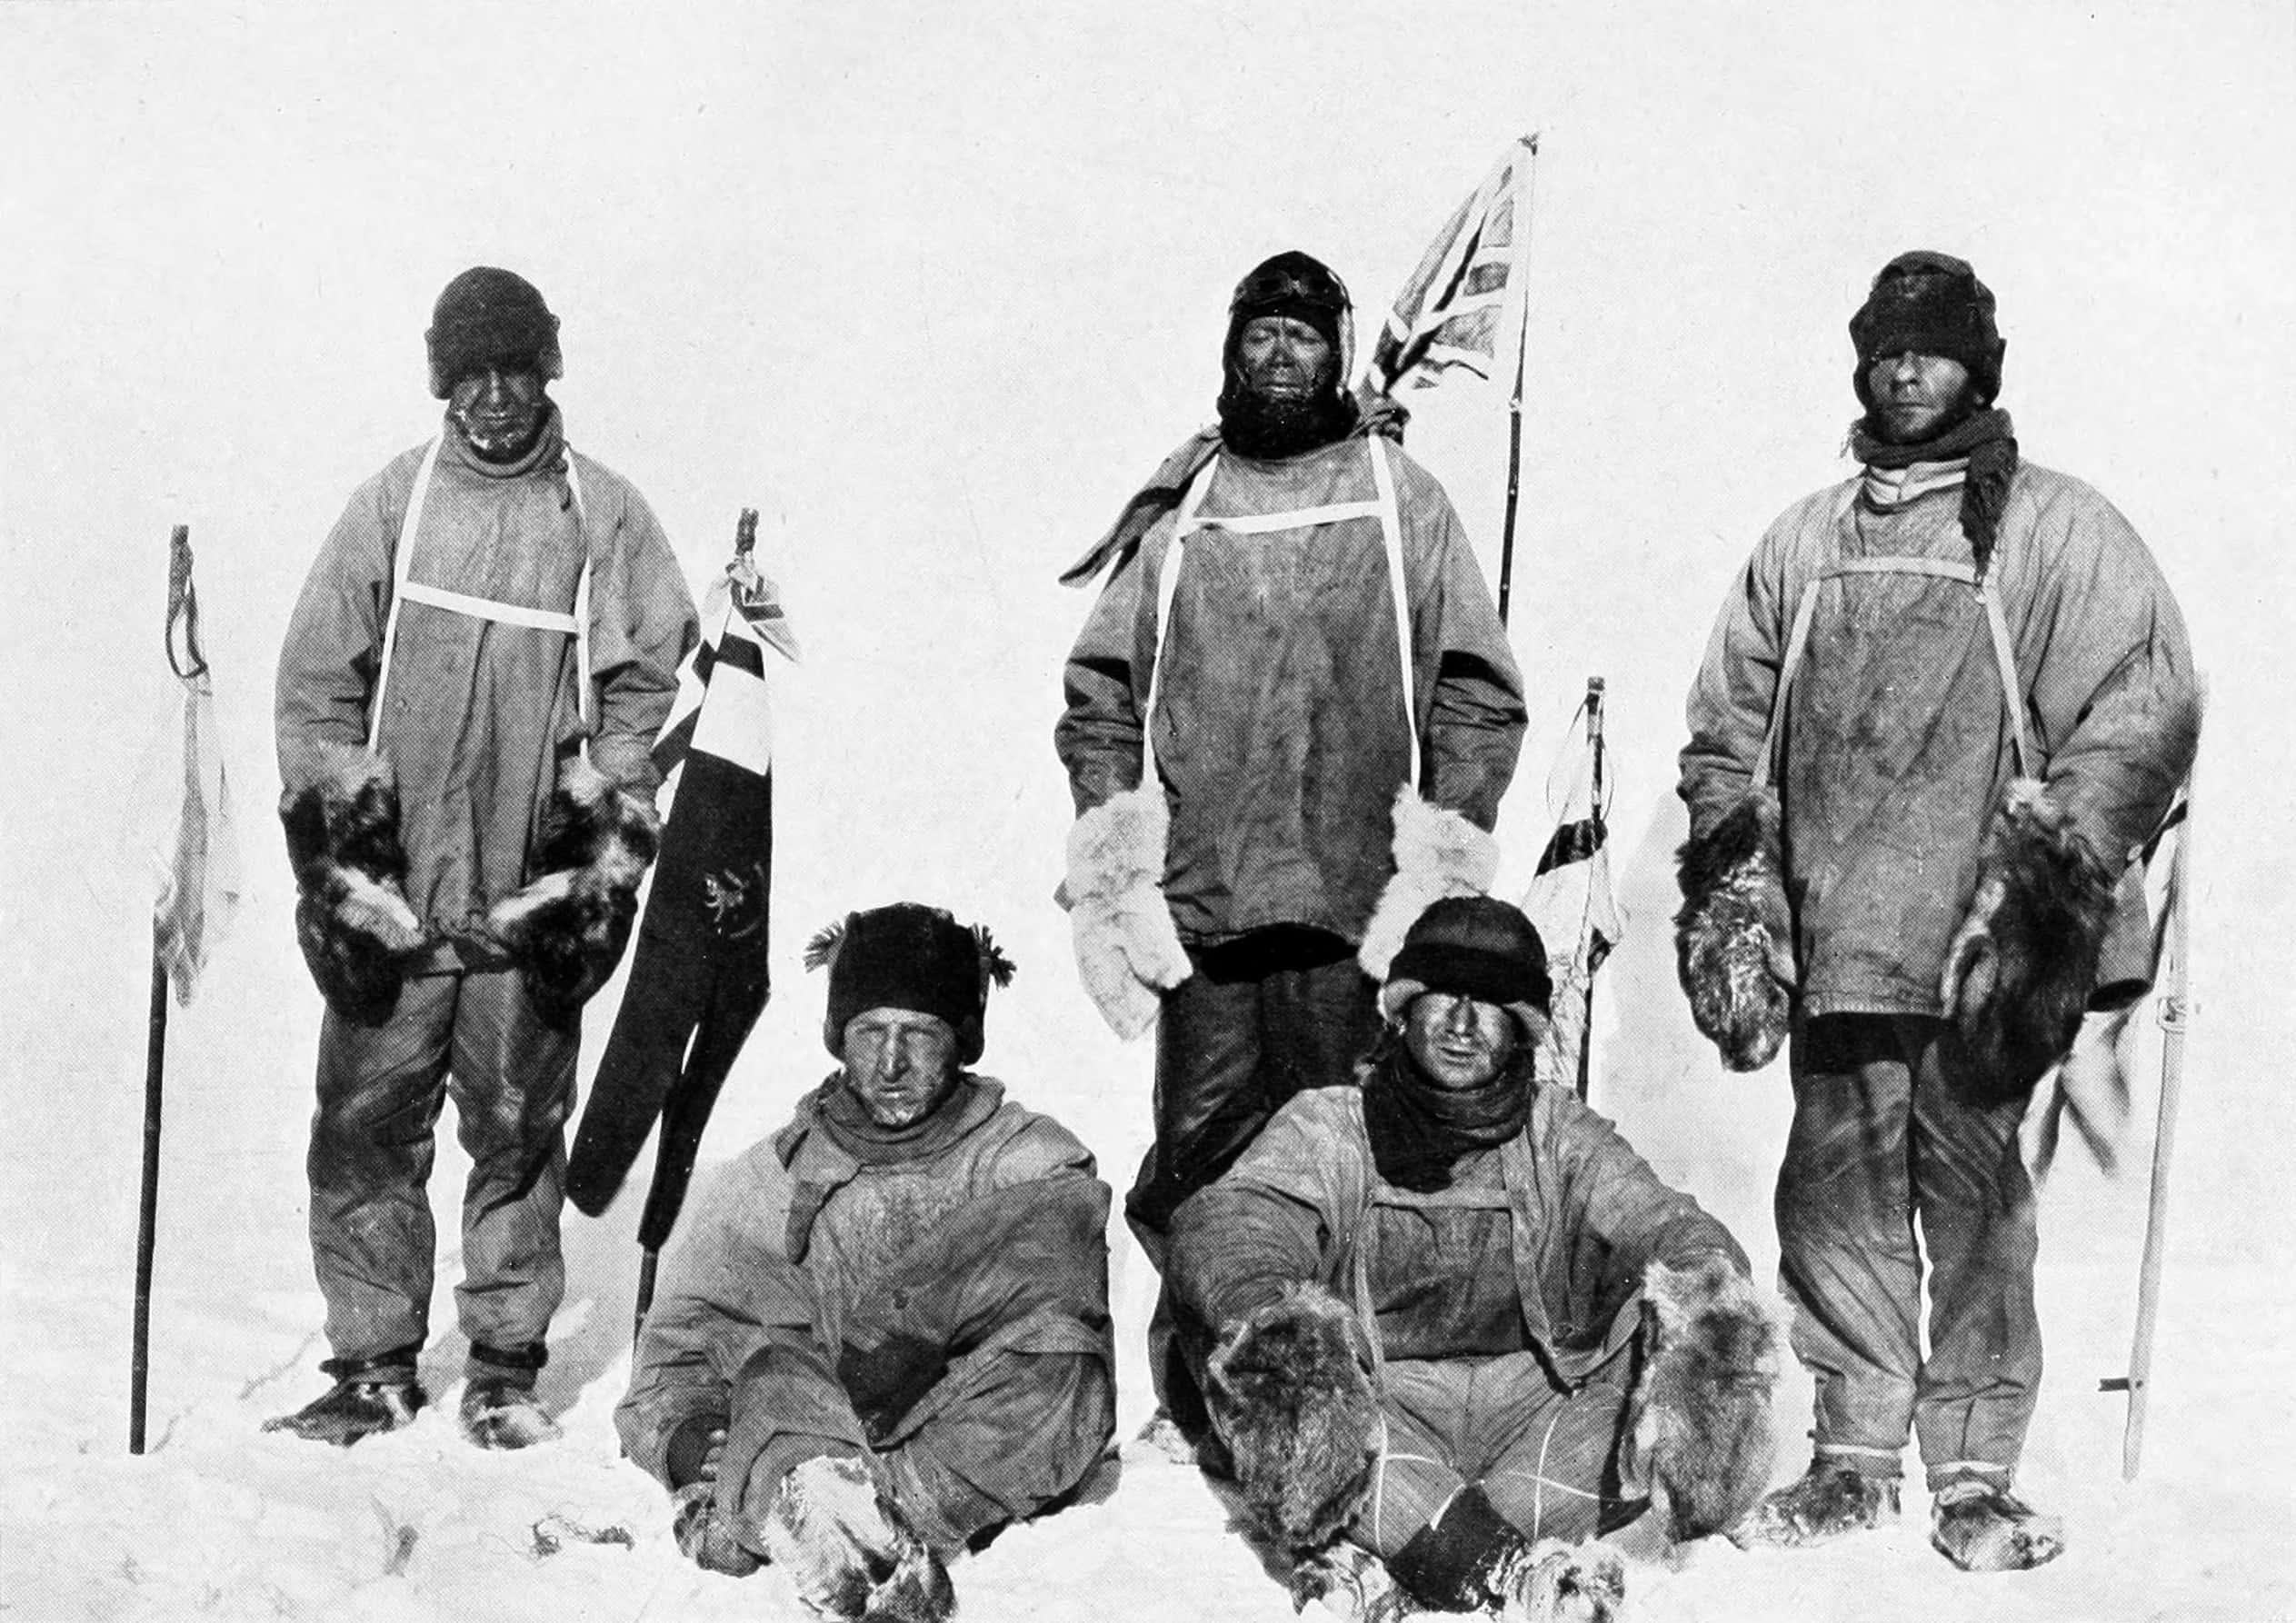 Polar Exploration facts